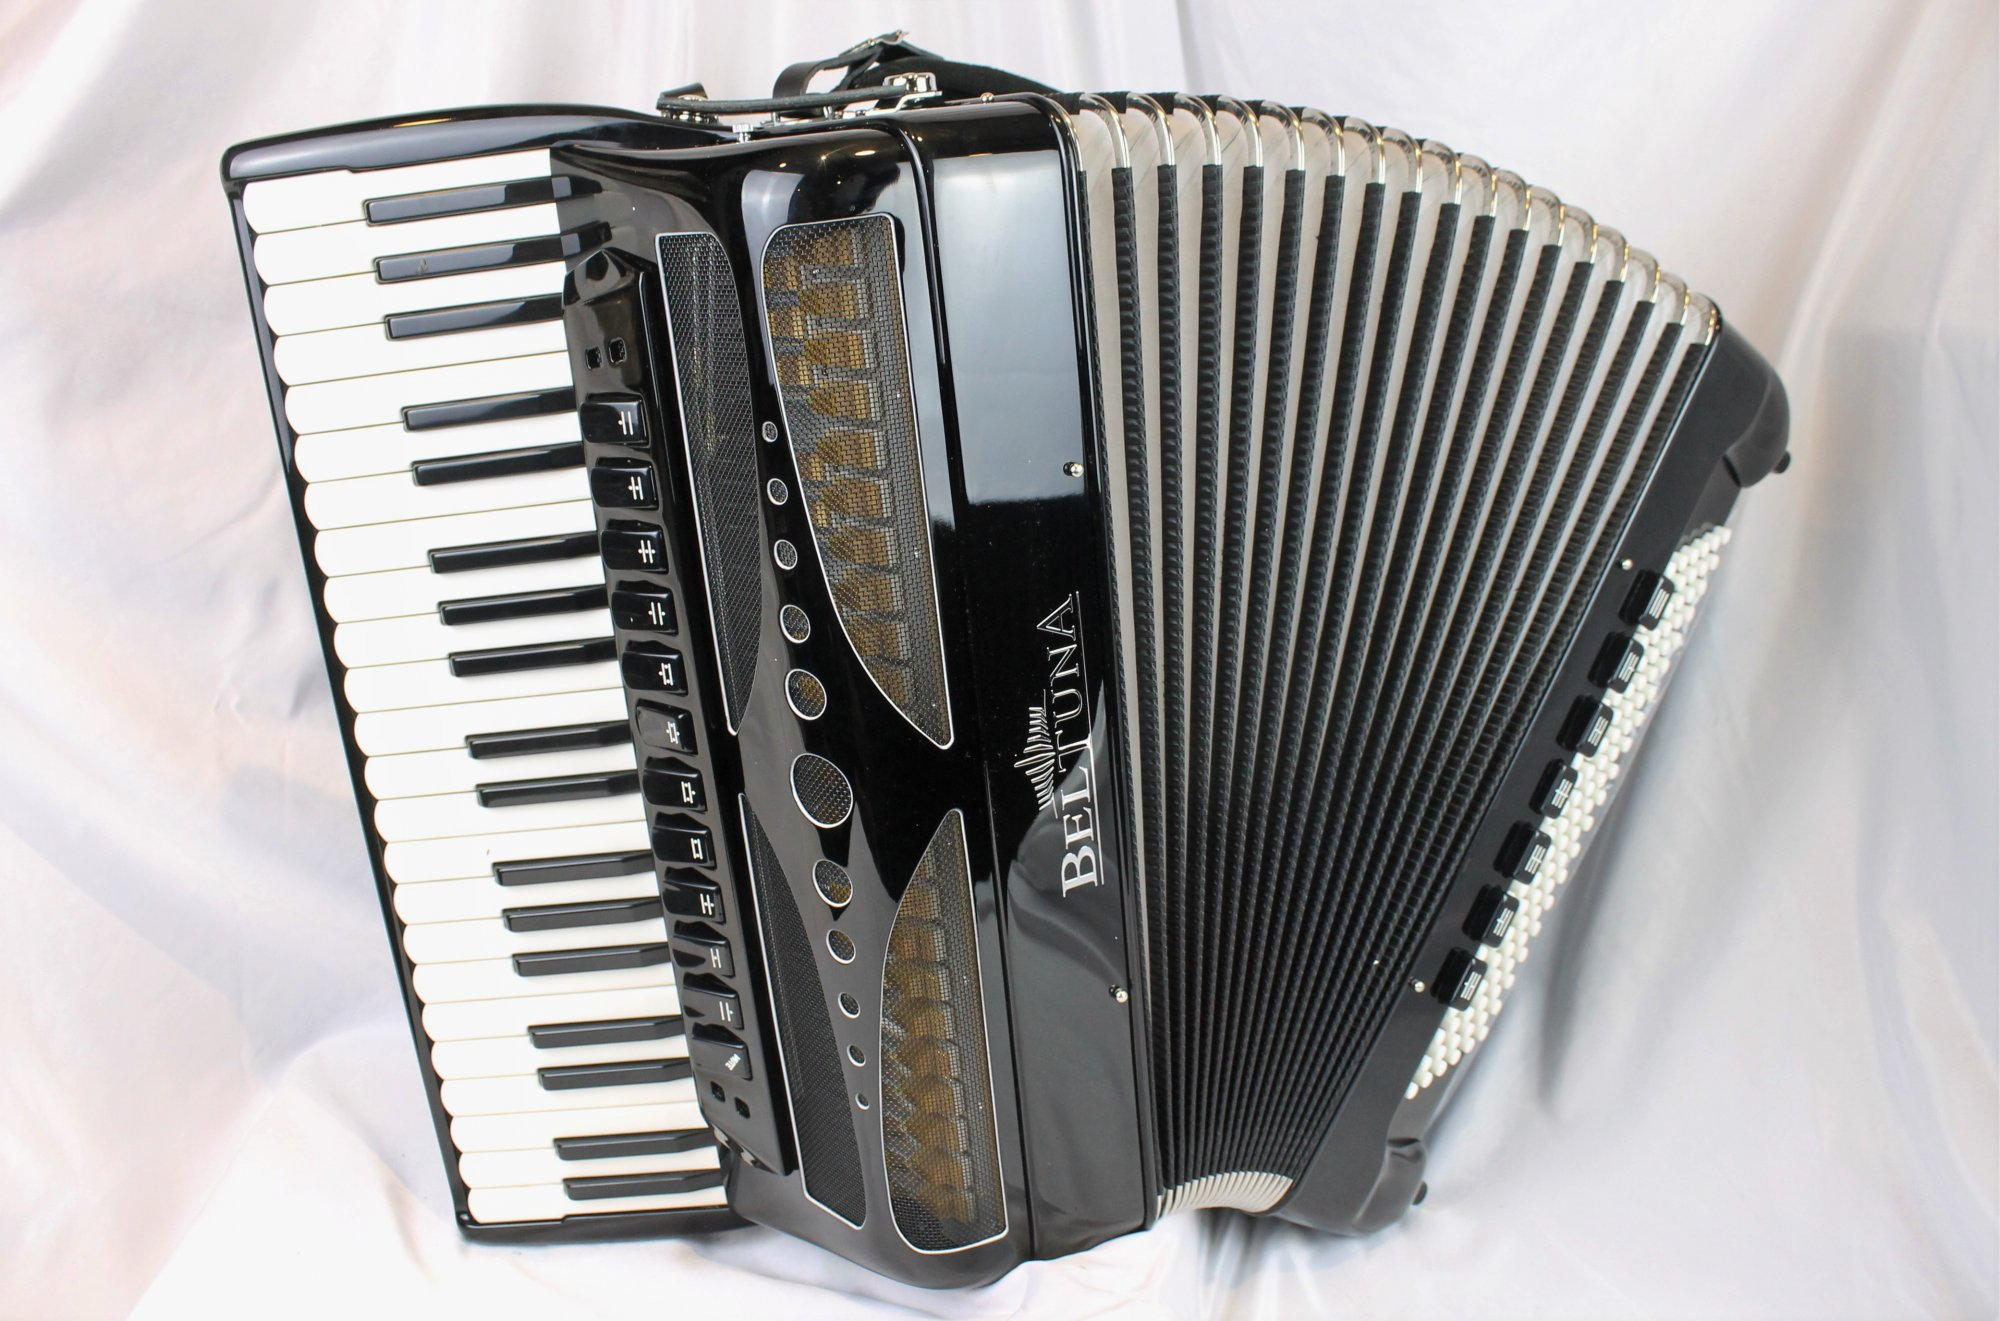 NEW Black Beltuna Play IV Luxe Pro 120C-P Double Tone Chamber Piano Accordion 41 120